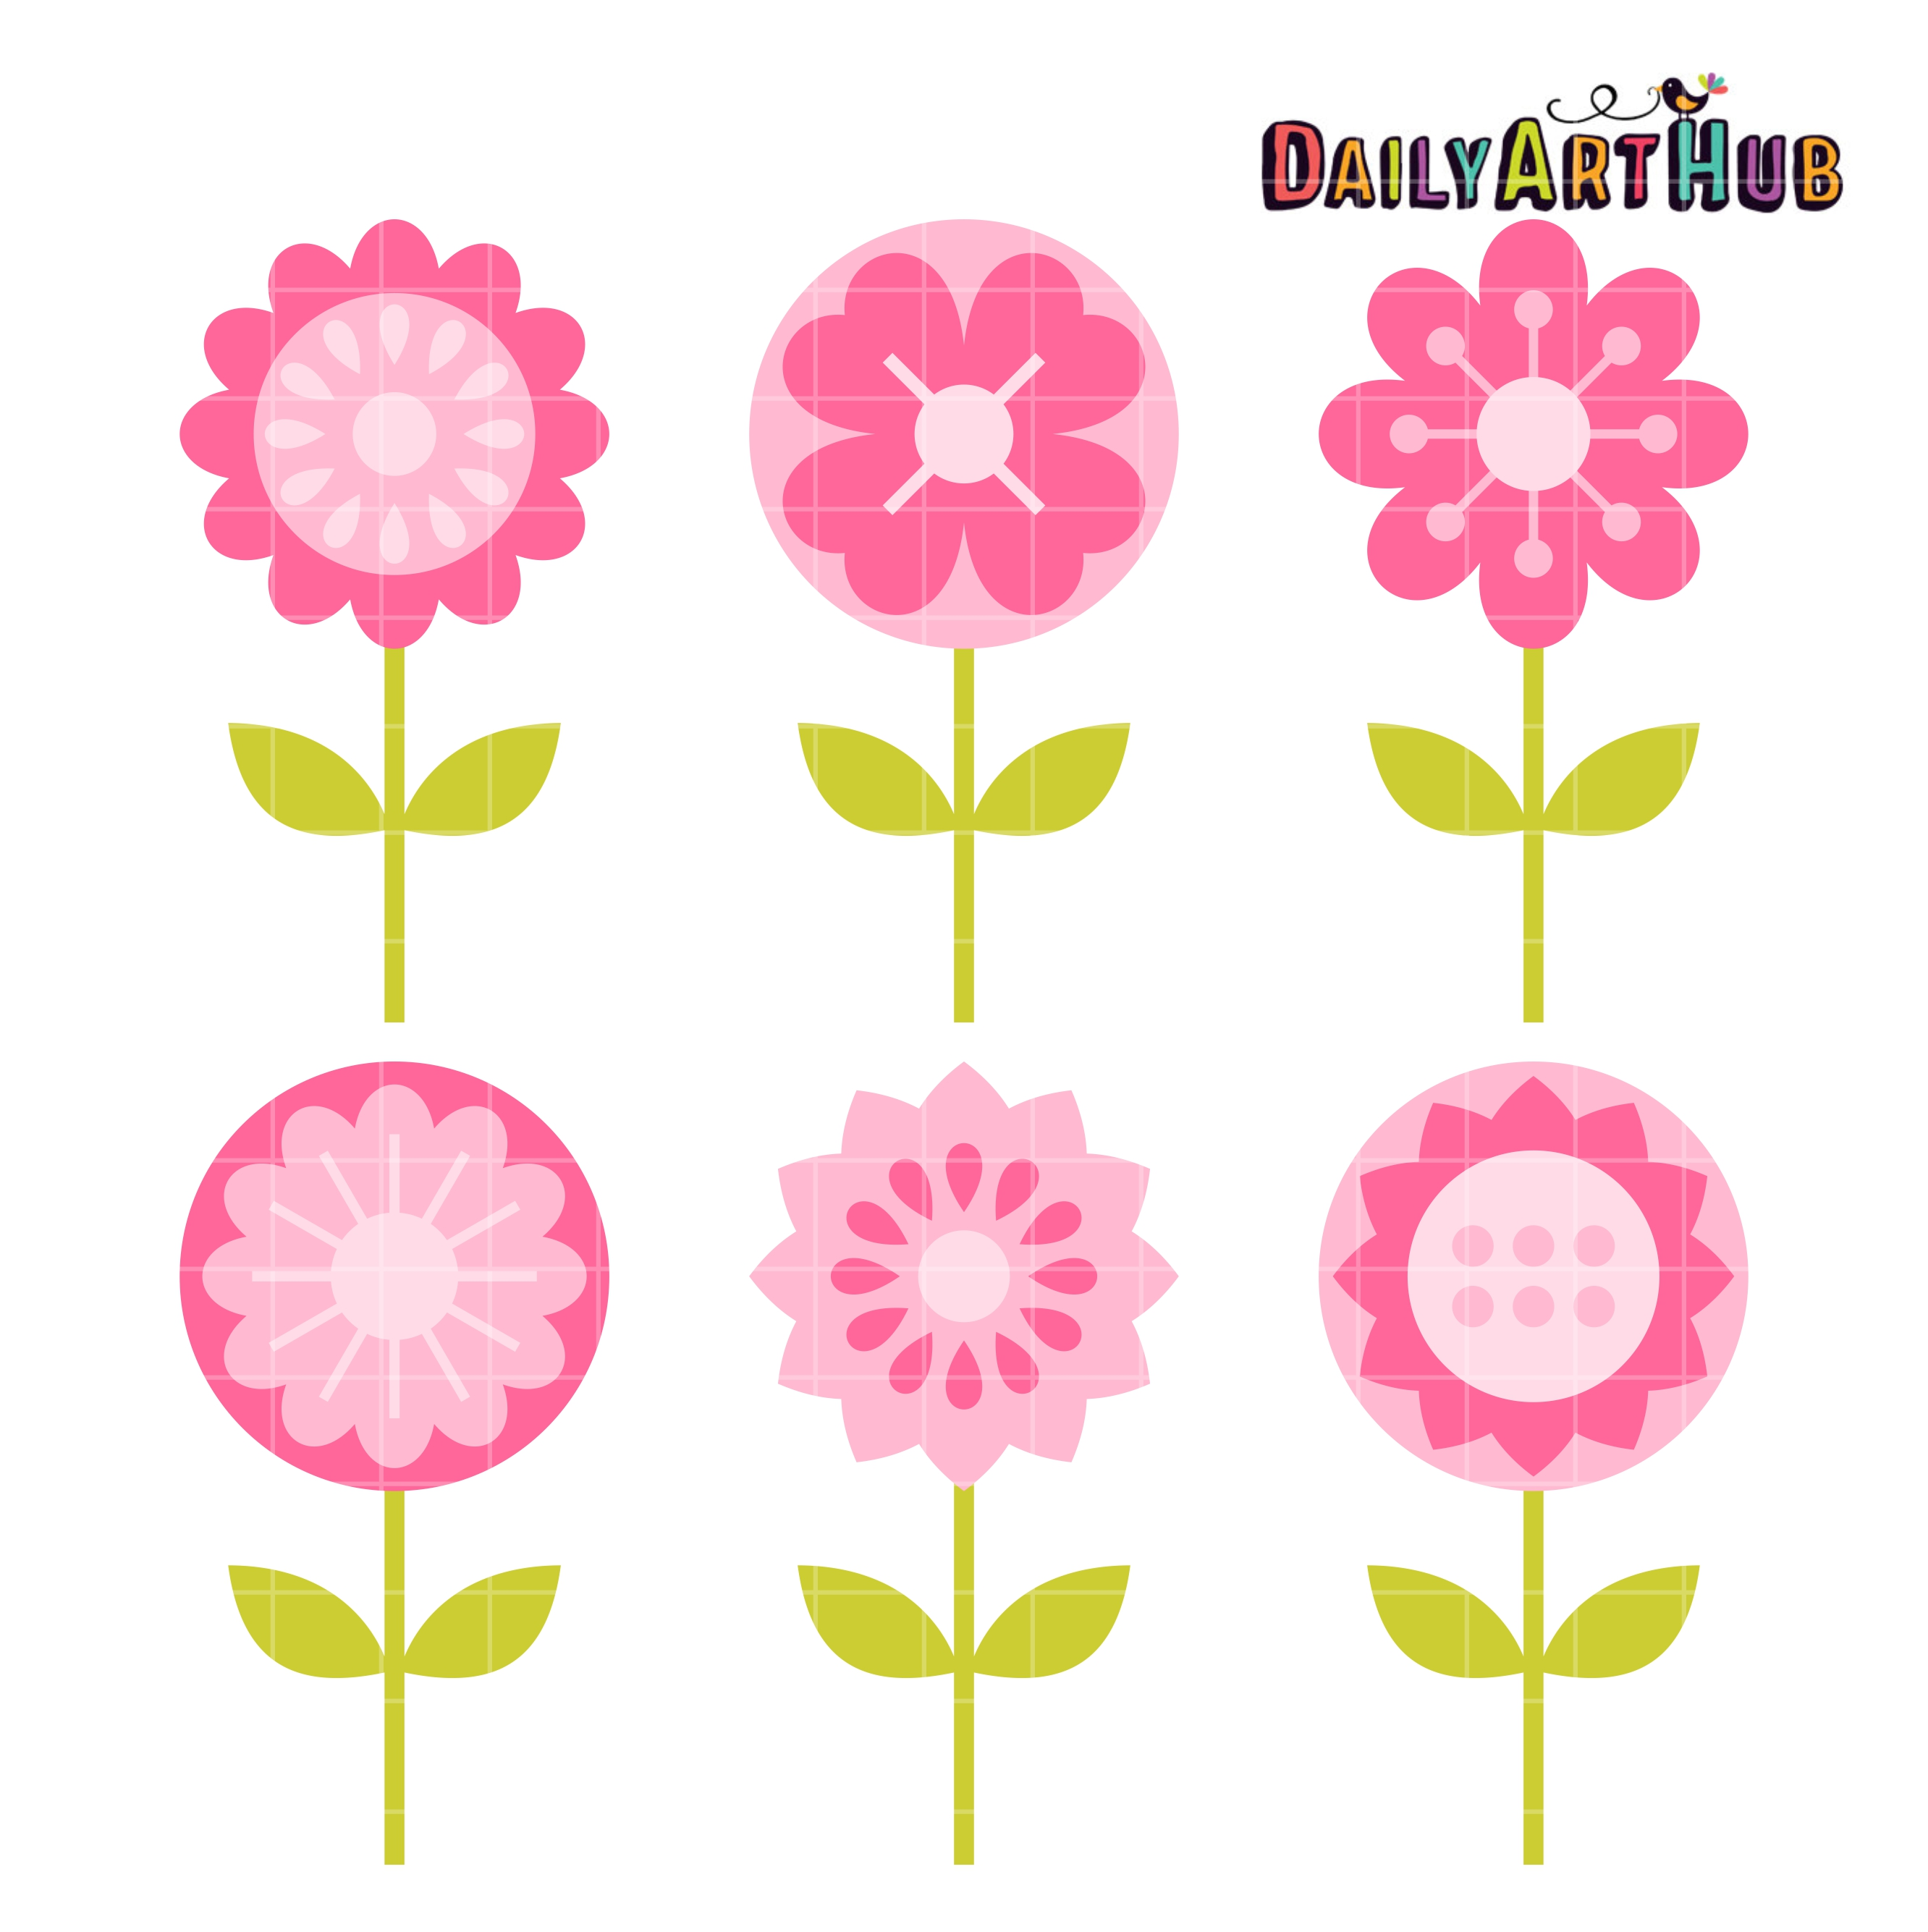 2664x2670 Pink Flowers Clip Art Set Daily Art Hub Free Clip Art Everyday